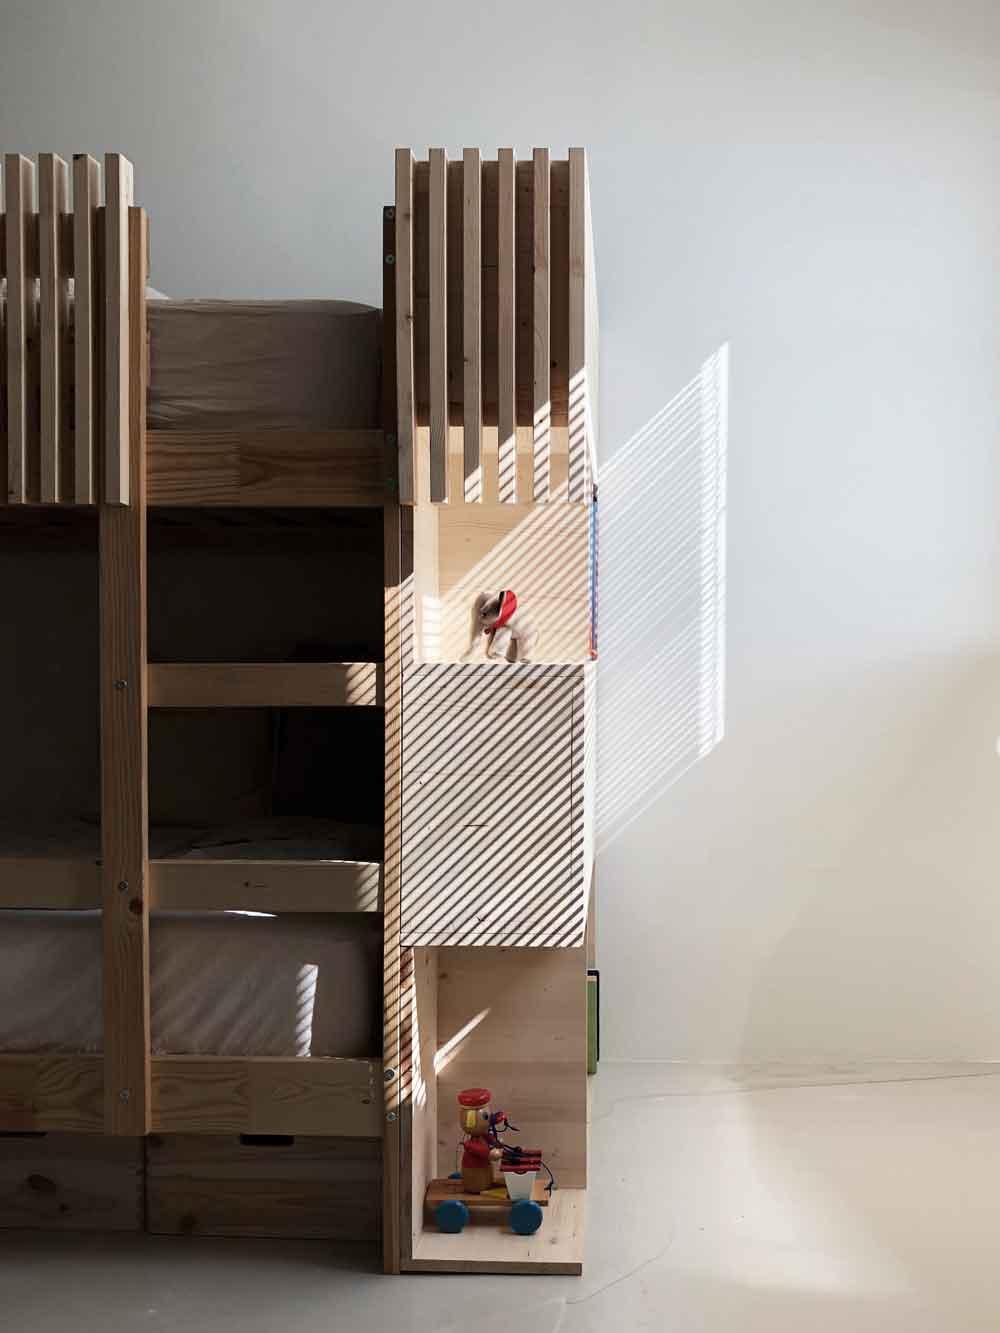 Schatten Stockbett Holzbett Kinderbett - DIY | ein Stockbett aus Holz einfach selber machen